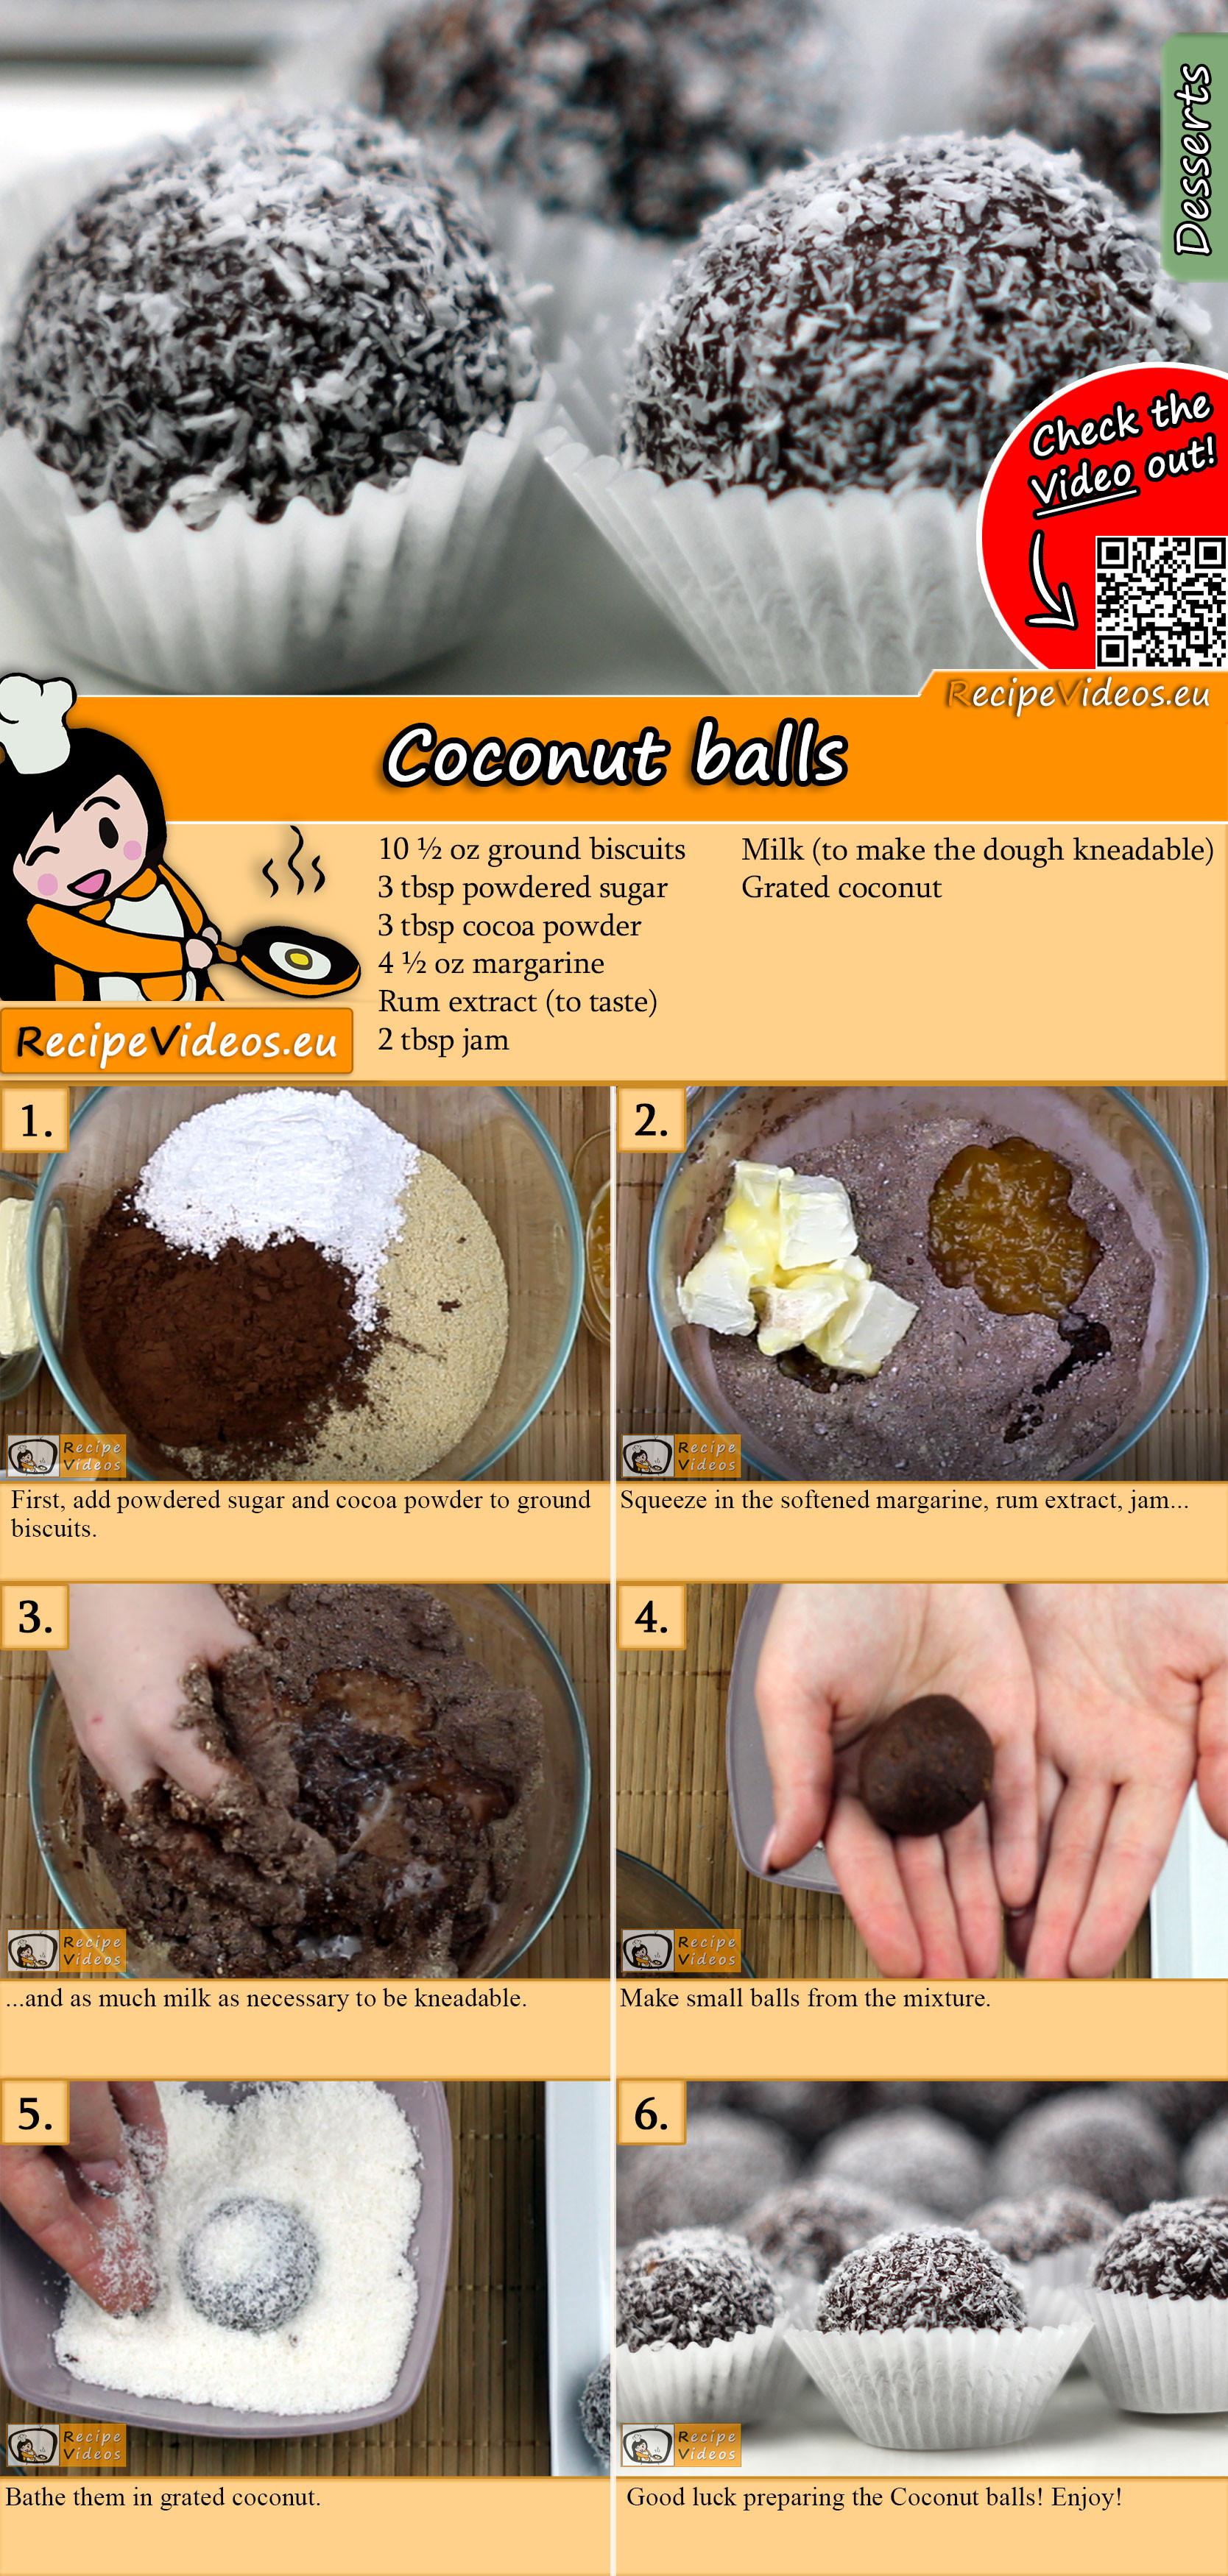 Coconut balls recipe with video